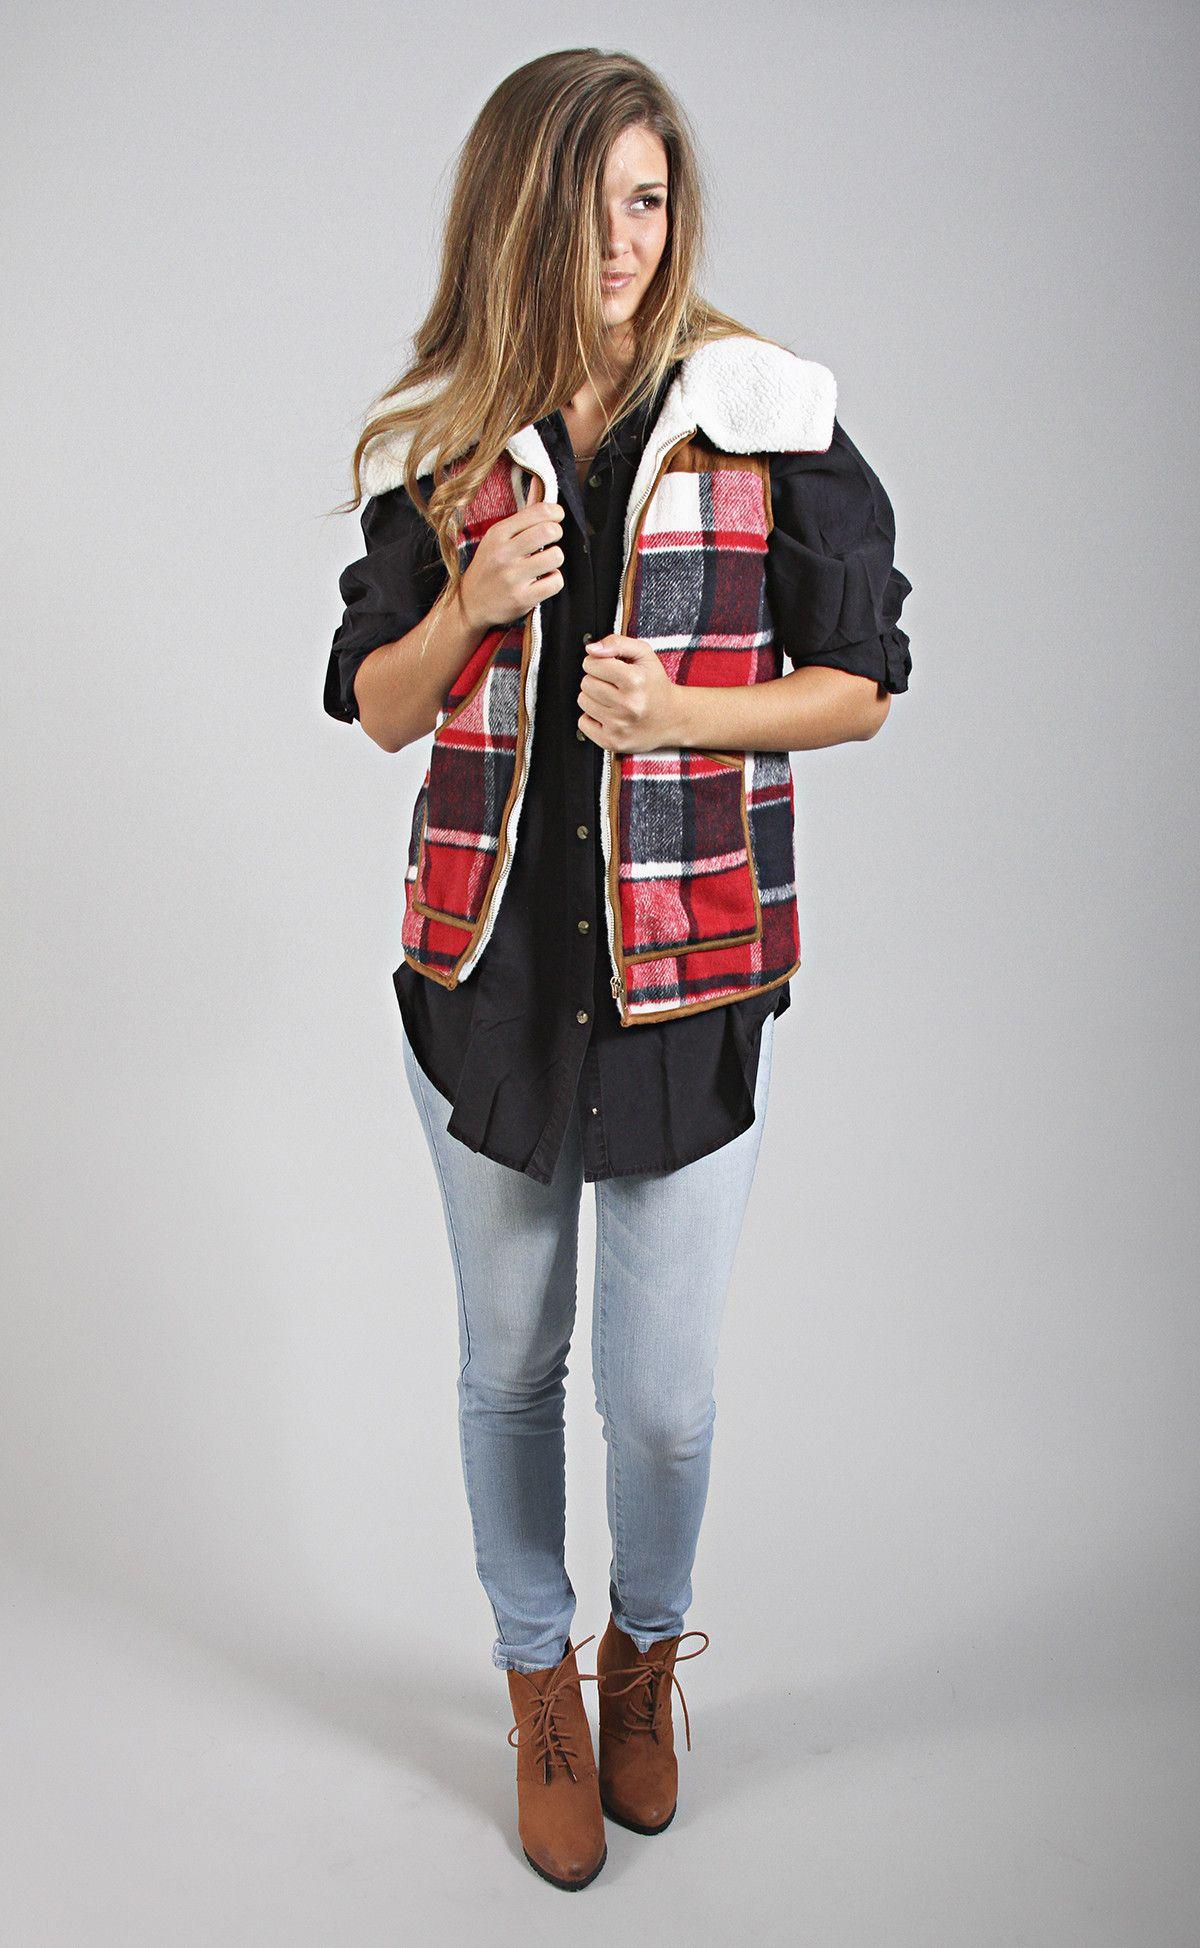 ski lodge plaid fur vest--Get 15% off + Free Shipping w/code 'RiffraffRepLauren' at checkout on ShopRiffraff.com!